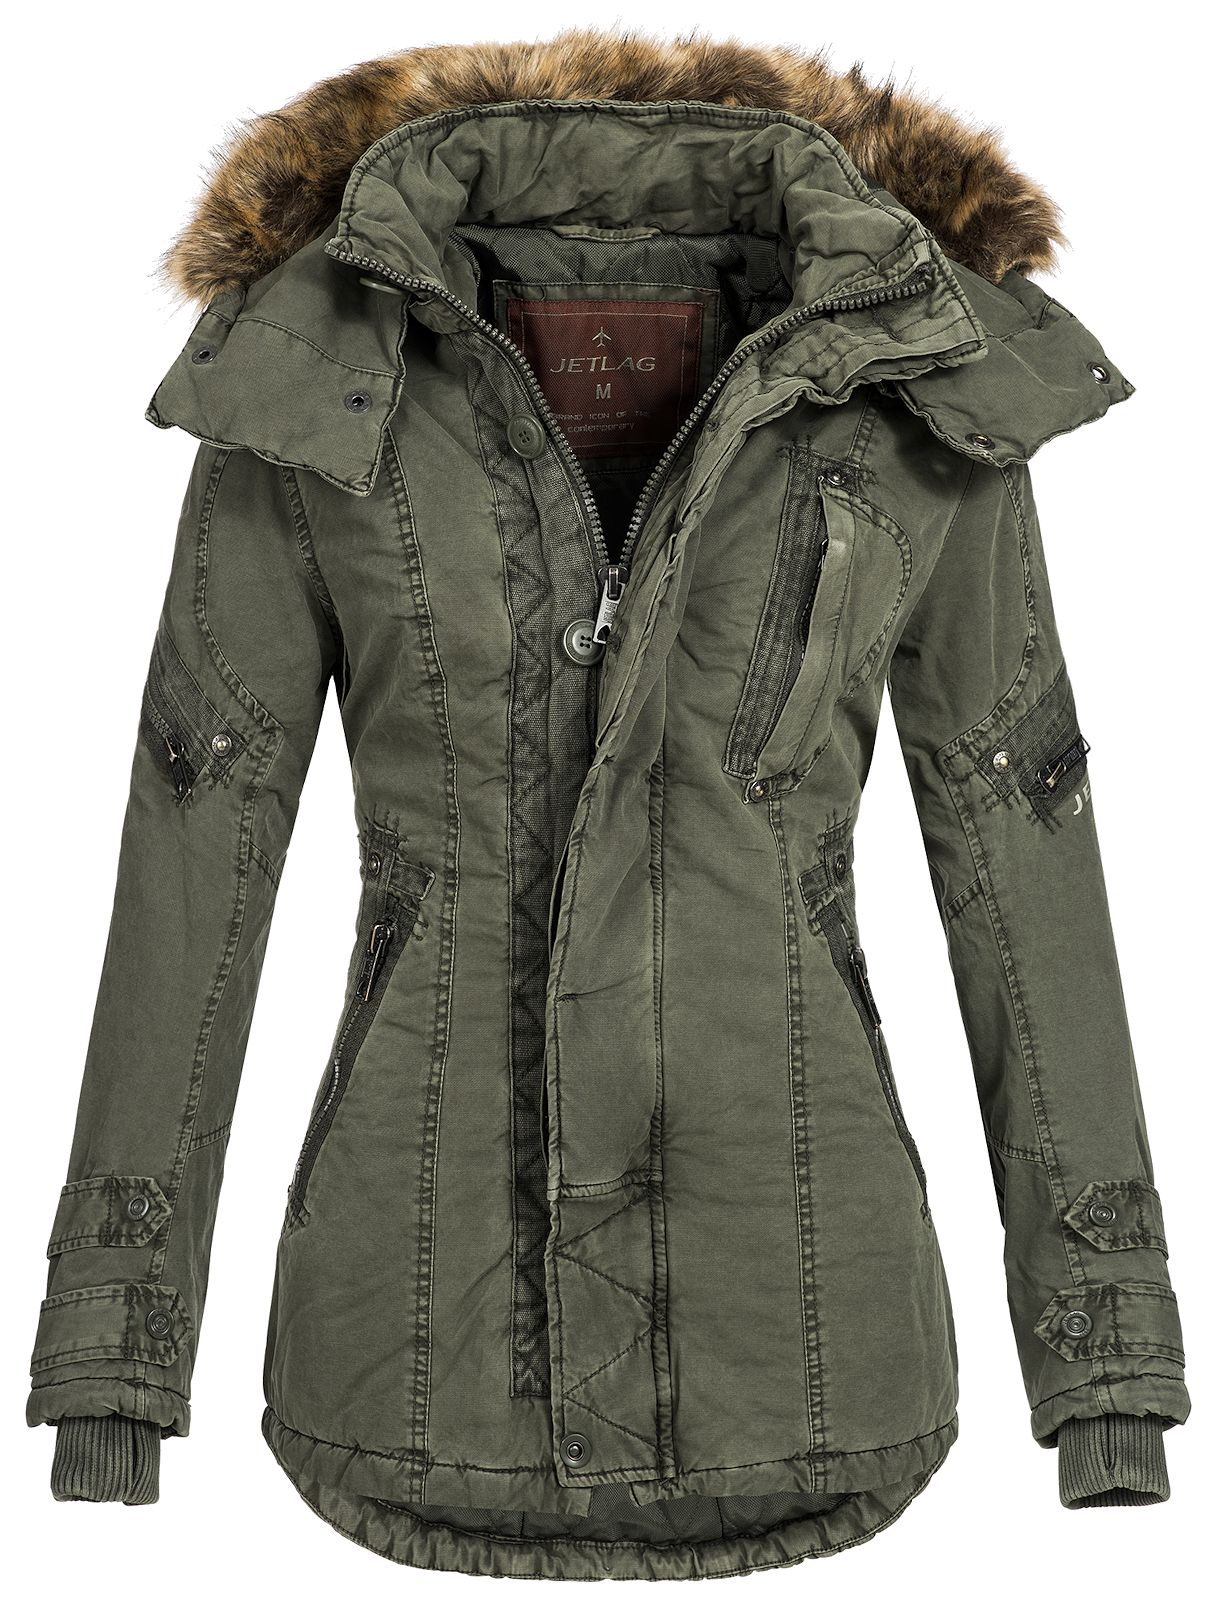 jet lag damen winterjacke parka sw 61c fellkapuze mantel. Black Bedroom Furniture Sets. Home Design Ideas